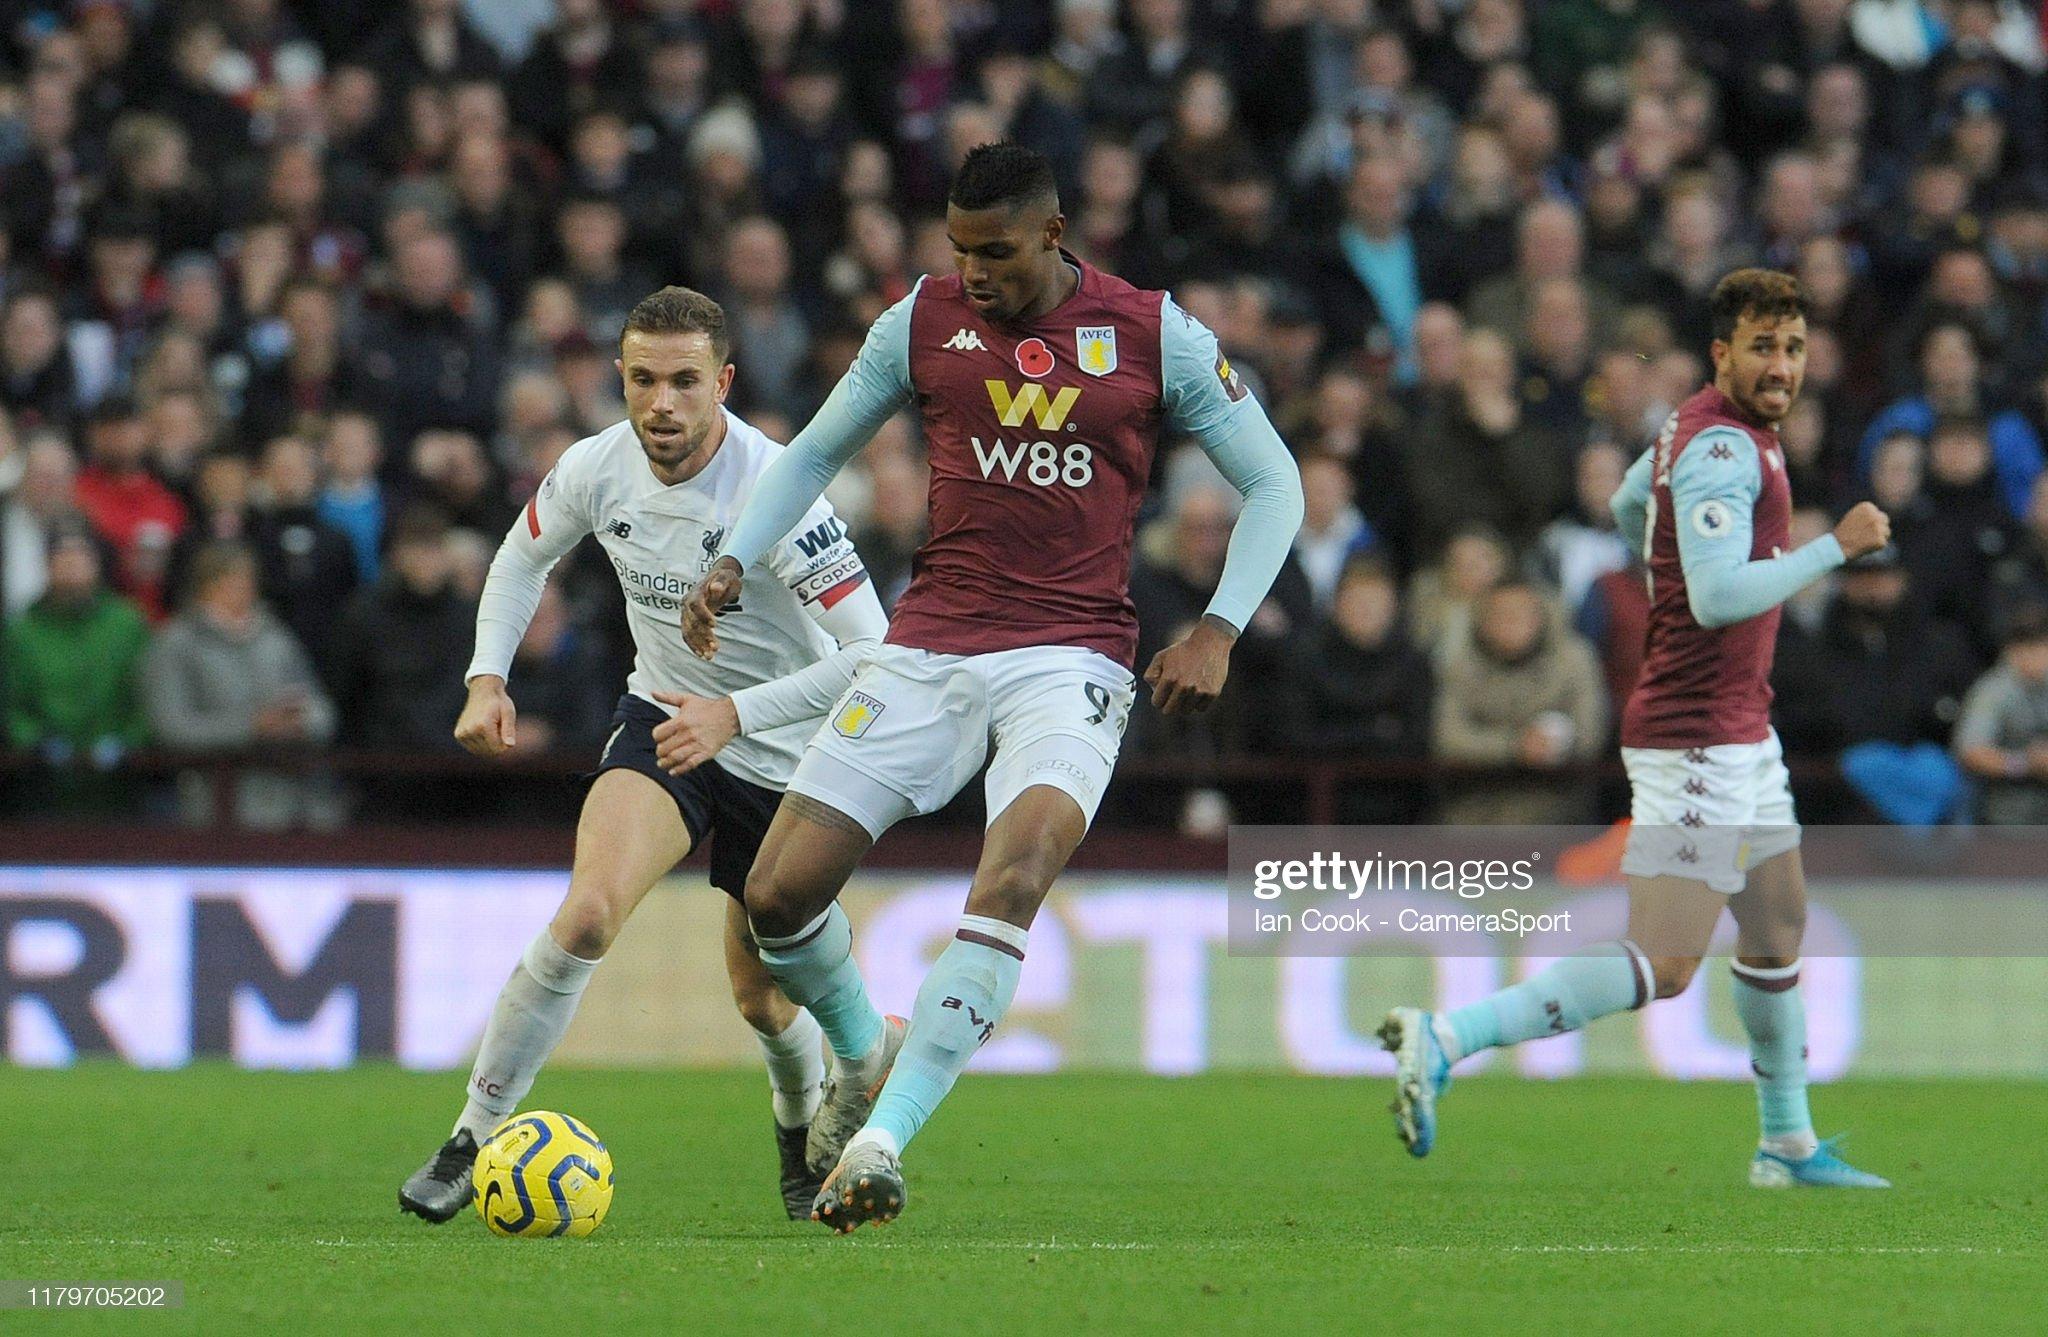 Aston Villa preview, prediction and odds